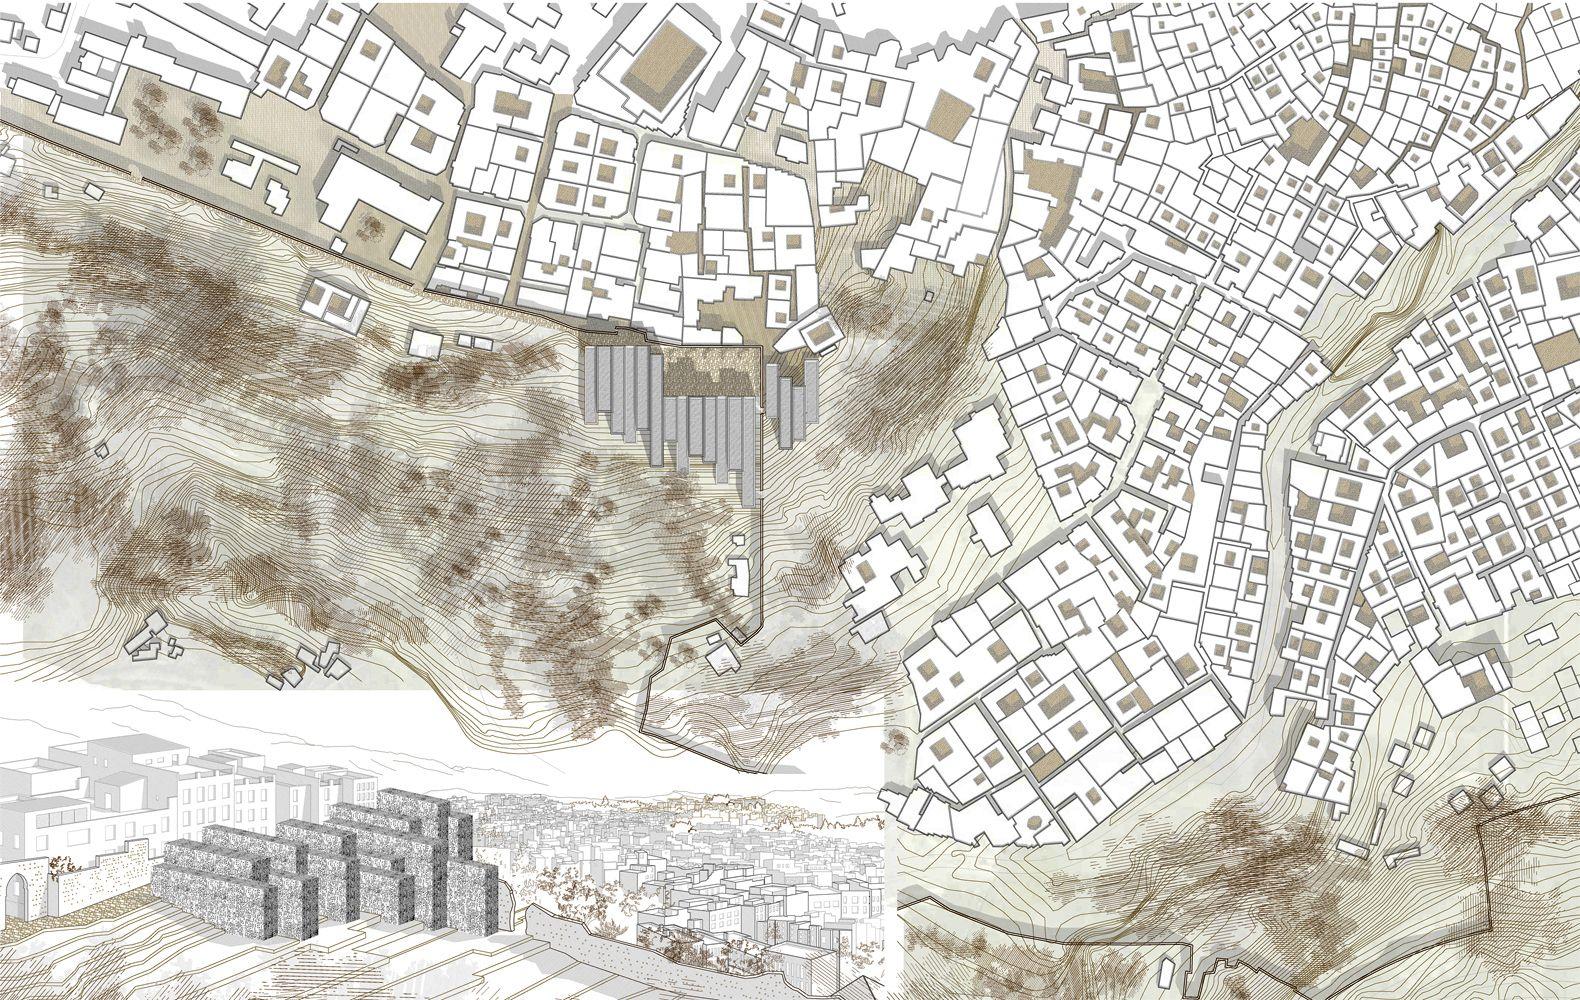 Plano de emplazamiento urbanismo arquitectura for Planos de arquitectura